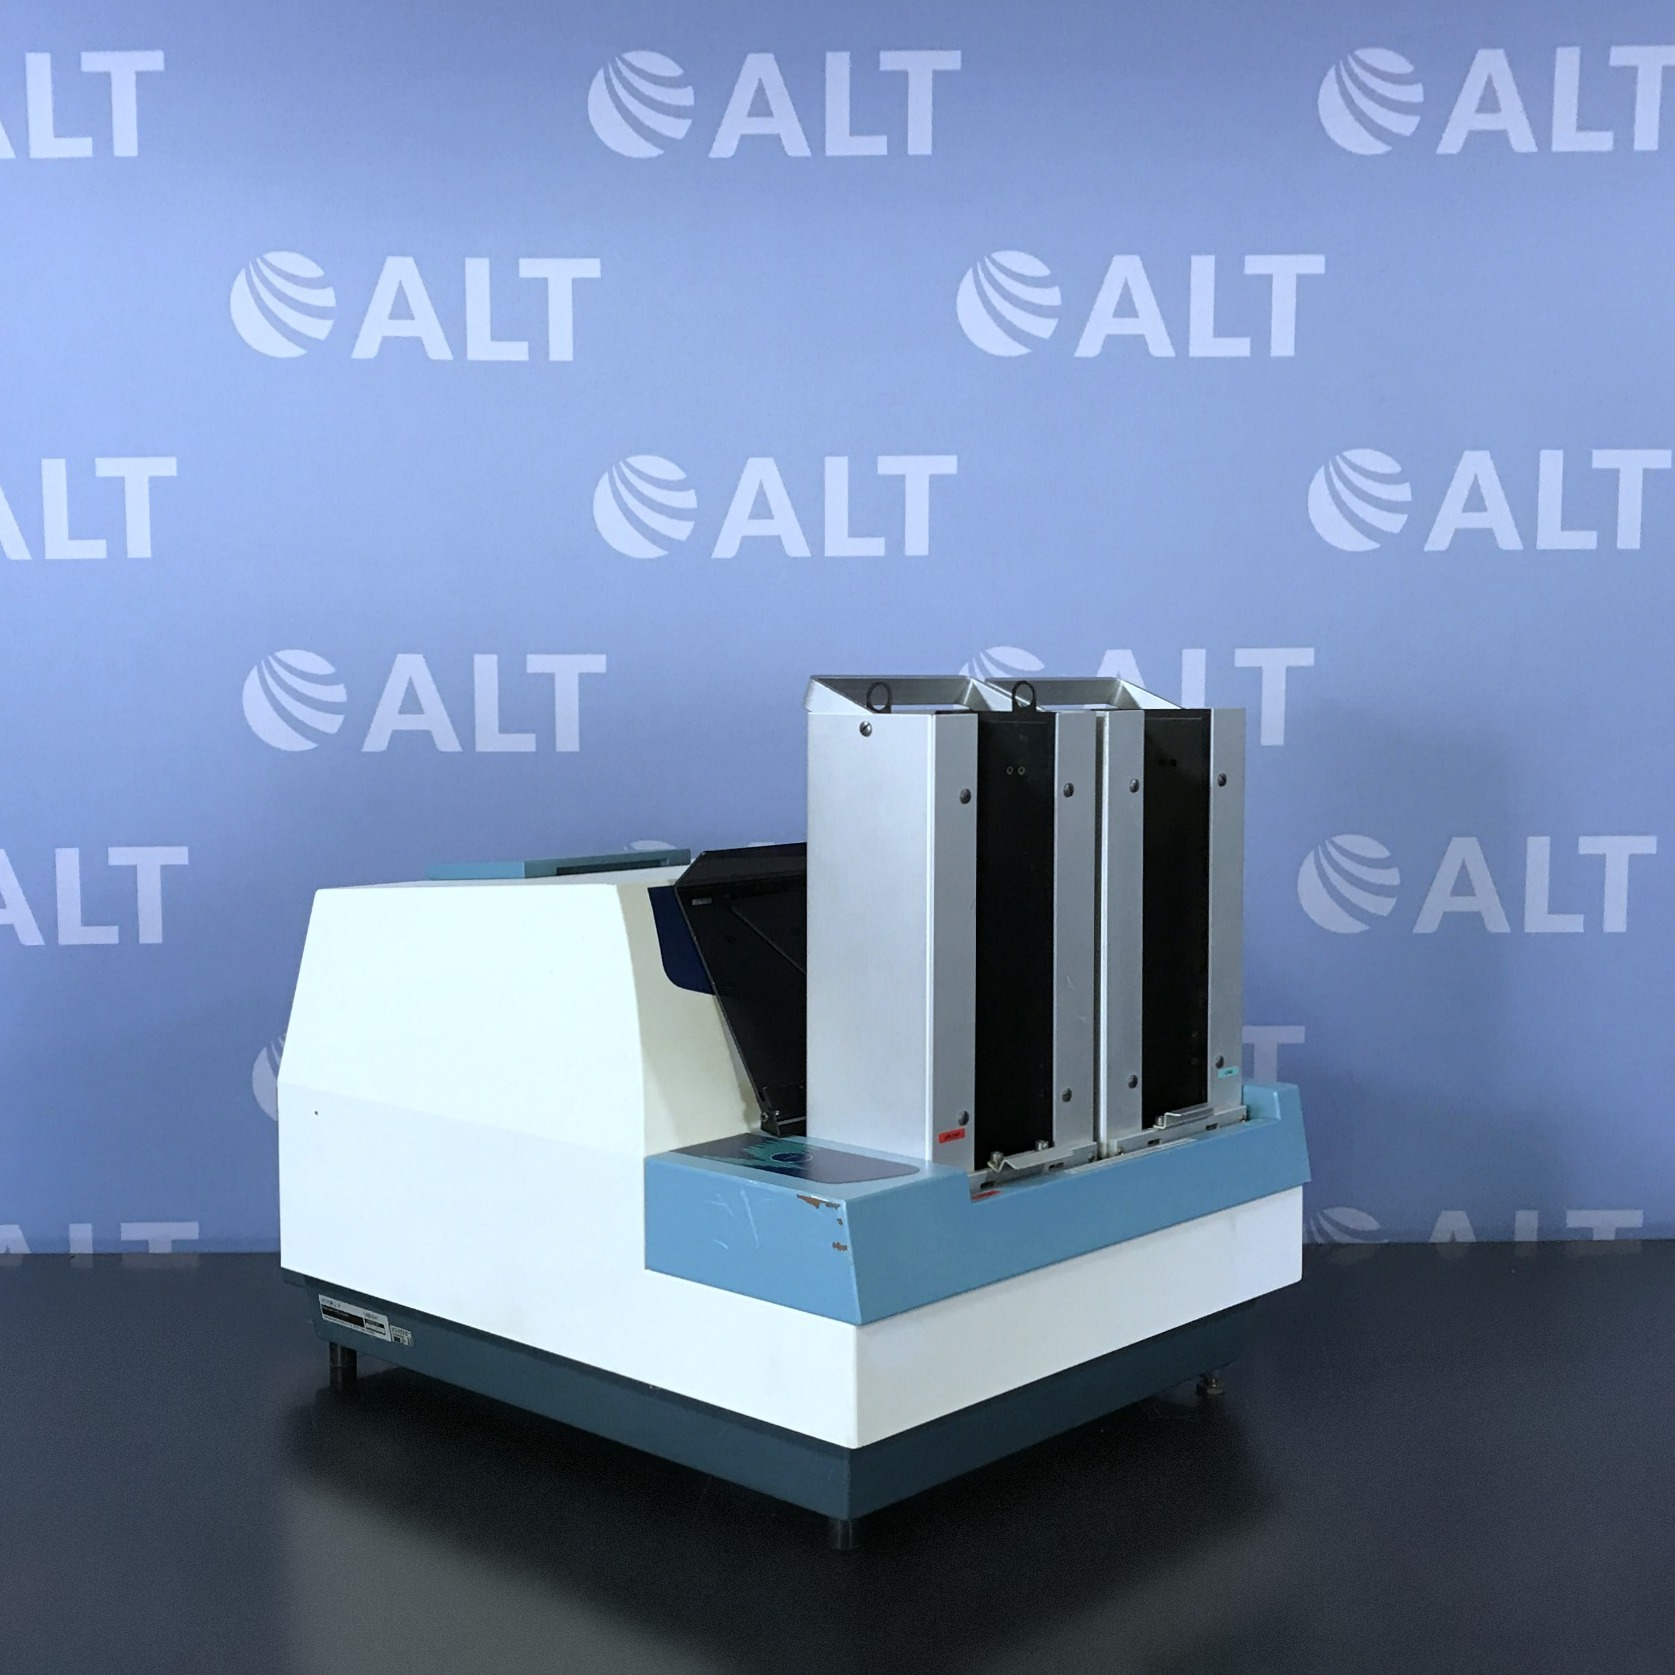 Wallac Victor2 1420-016 Multilabel Counter Image